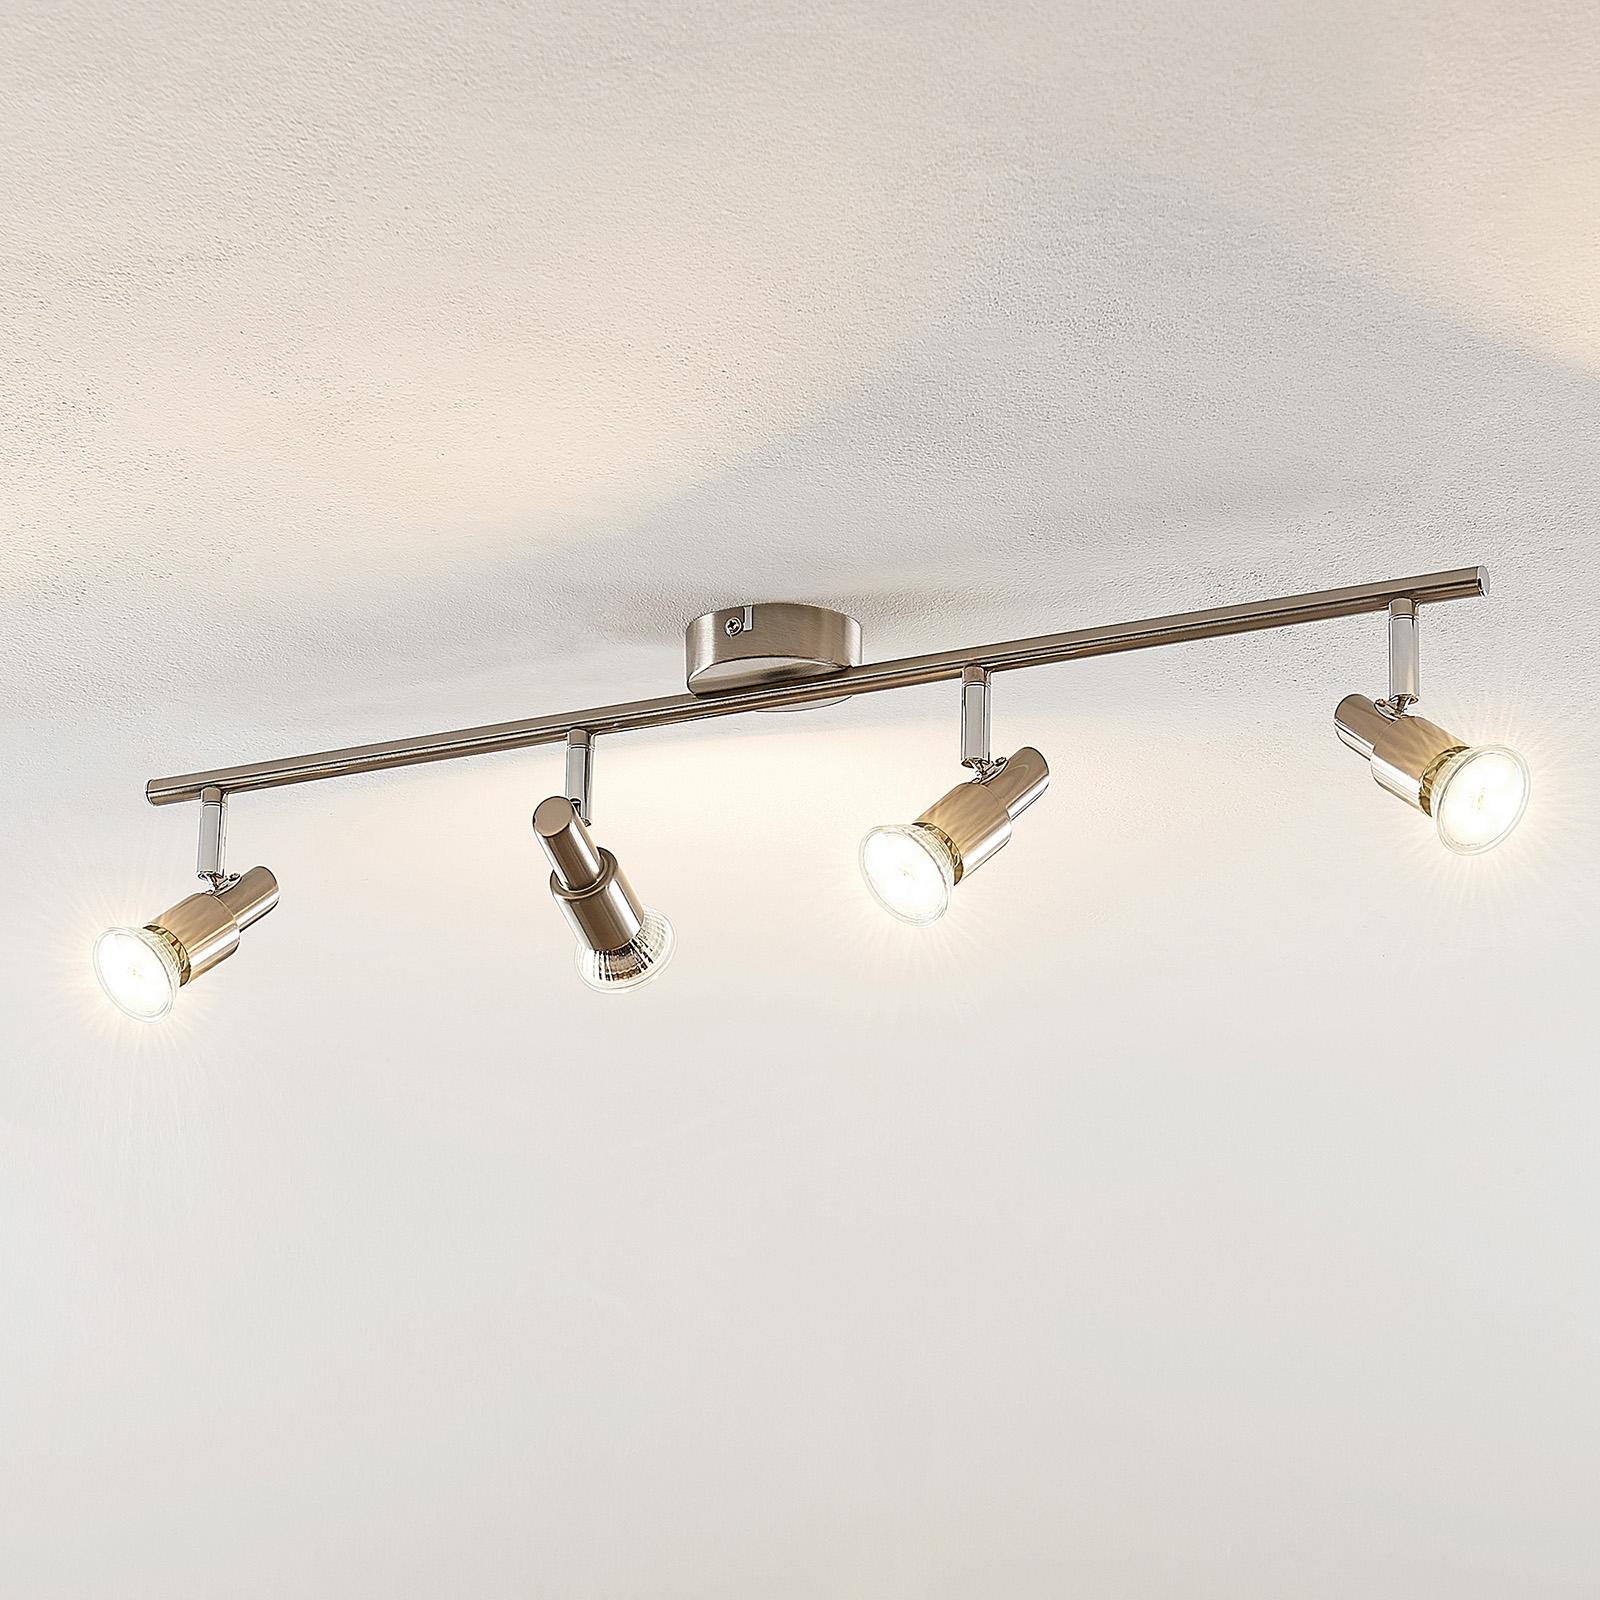 ELC Farida -LED-kohdevalo, nikkeli, 4-lamp.